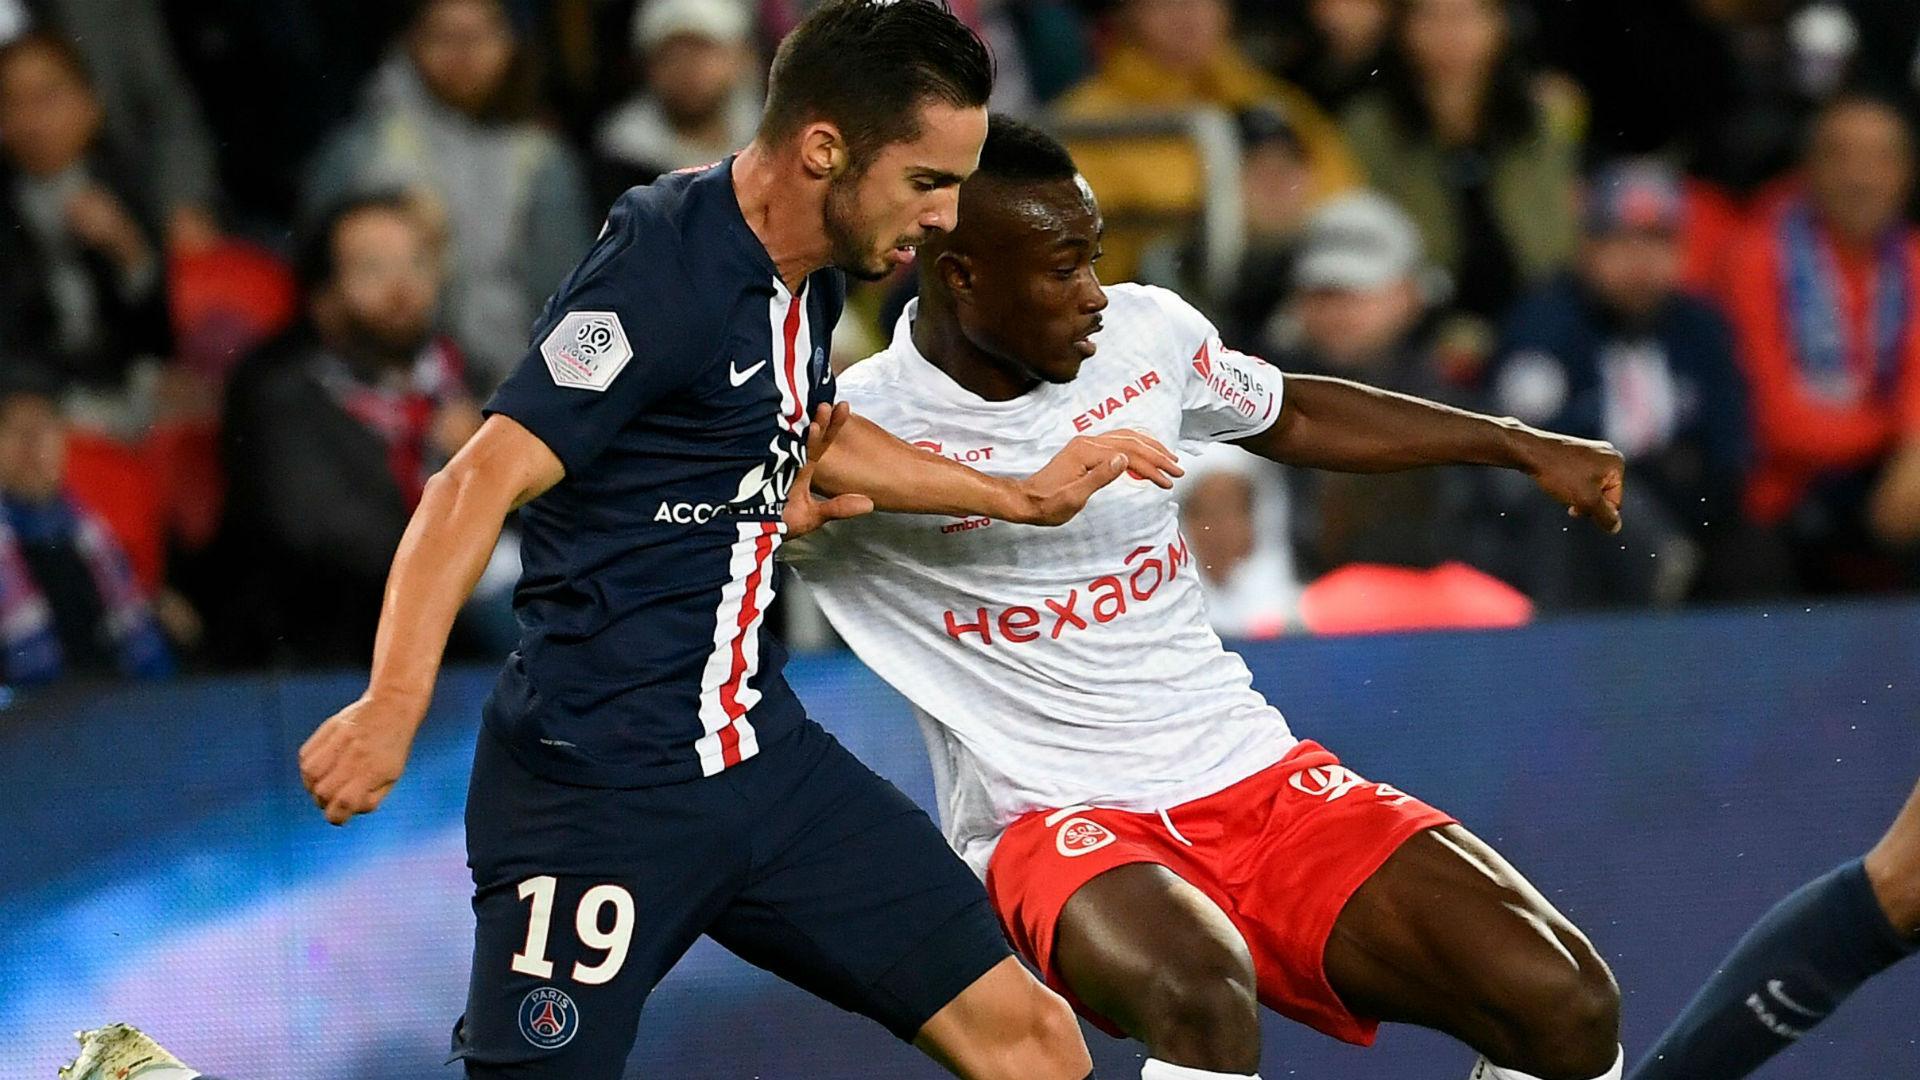 Pablo Sarabia PSG Reims Ligue 1 25092019